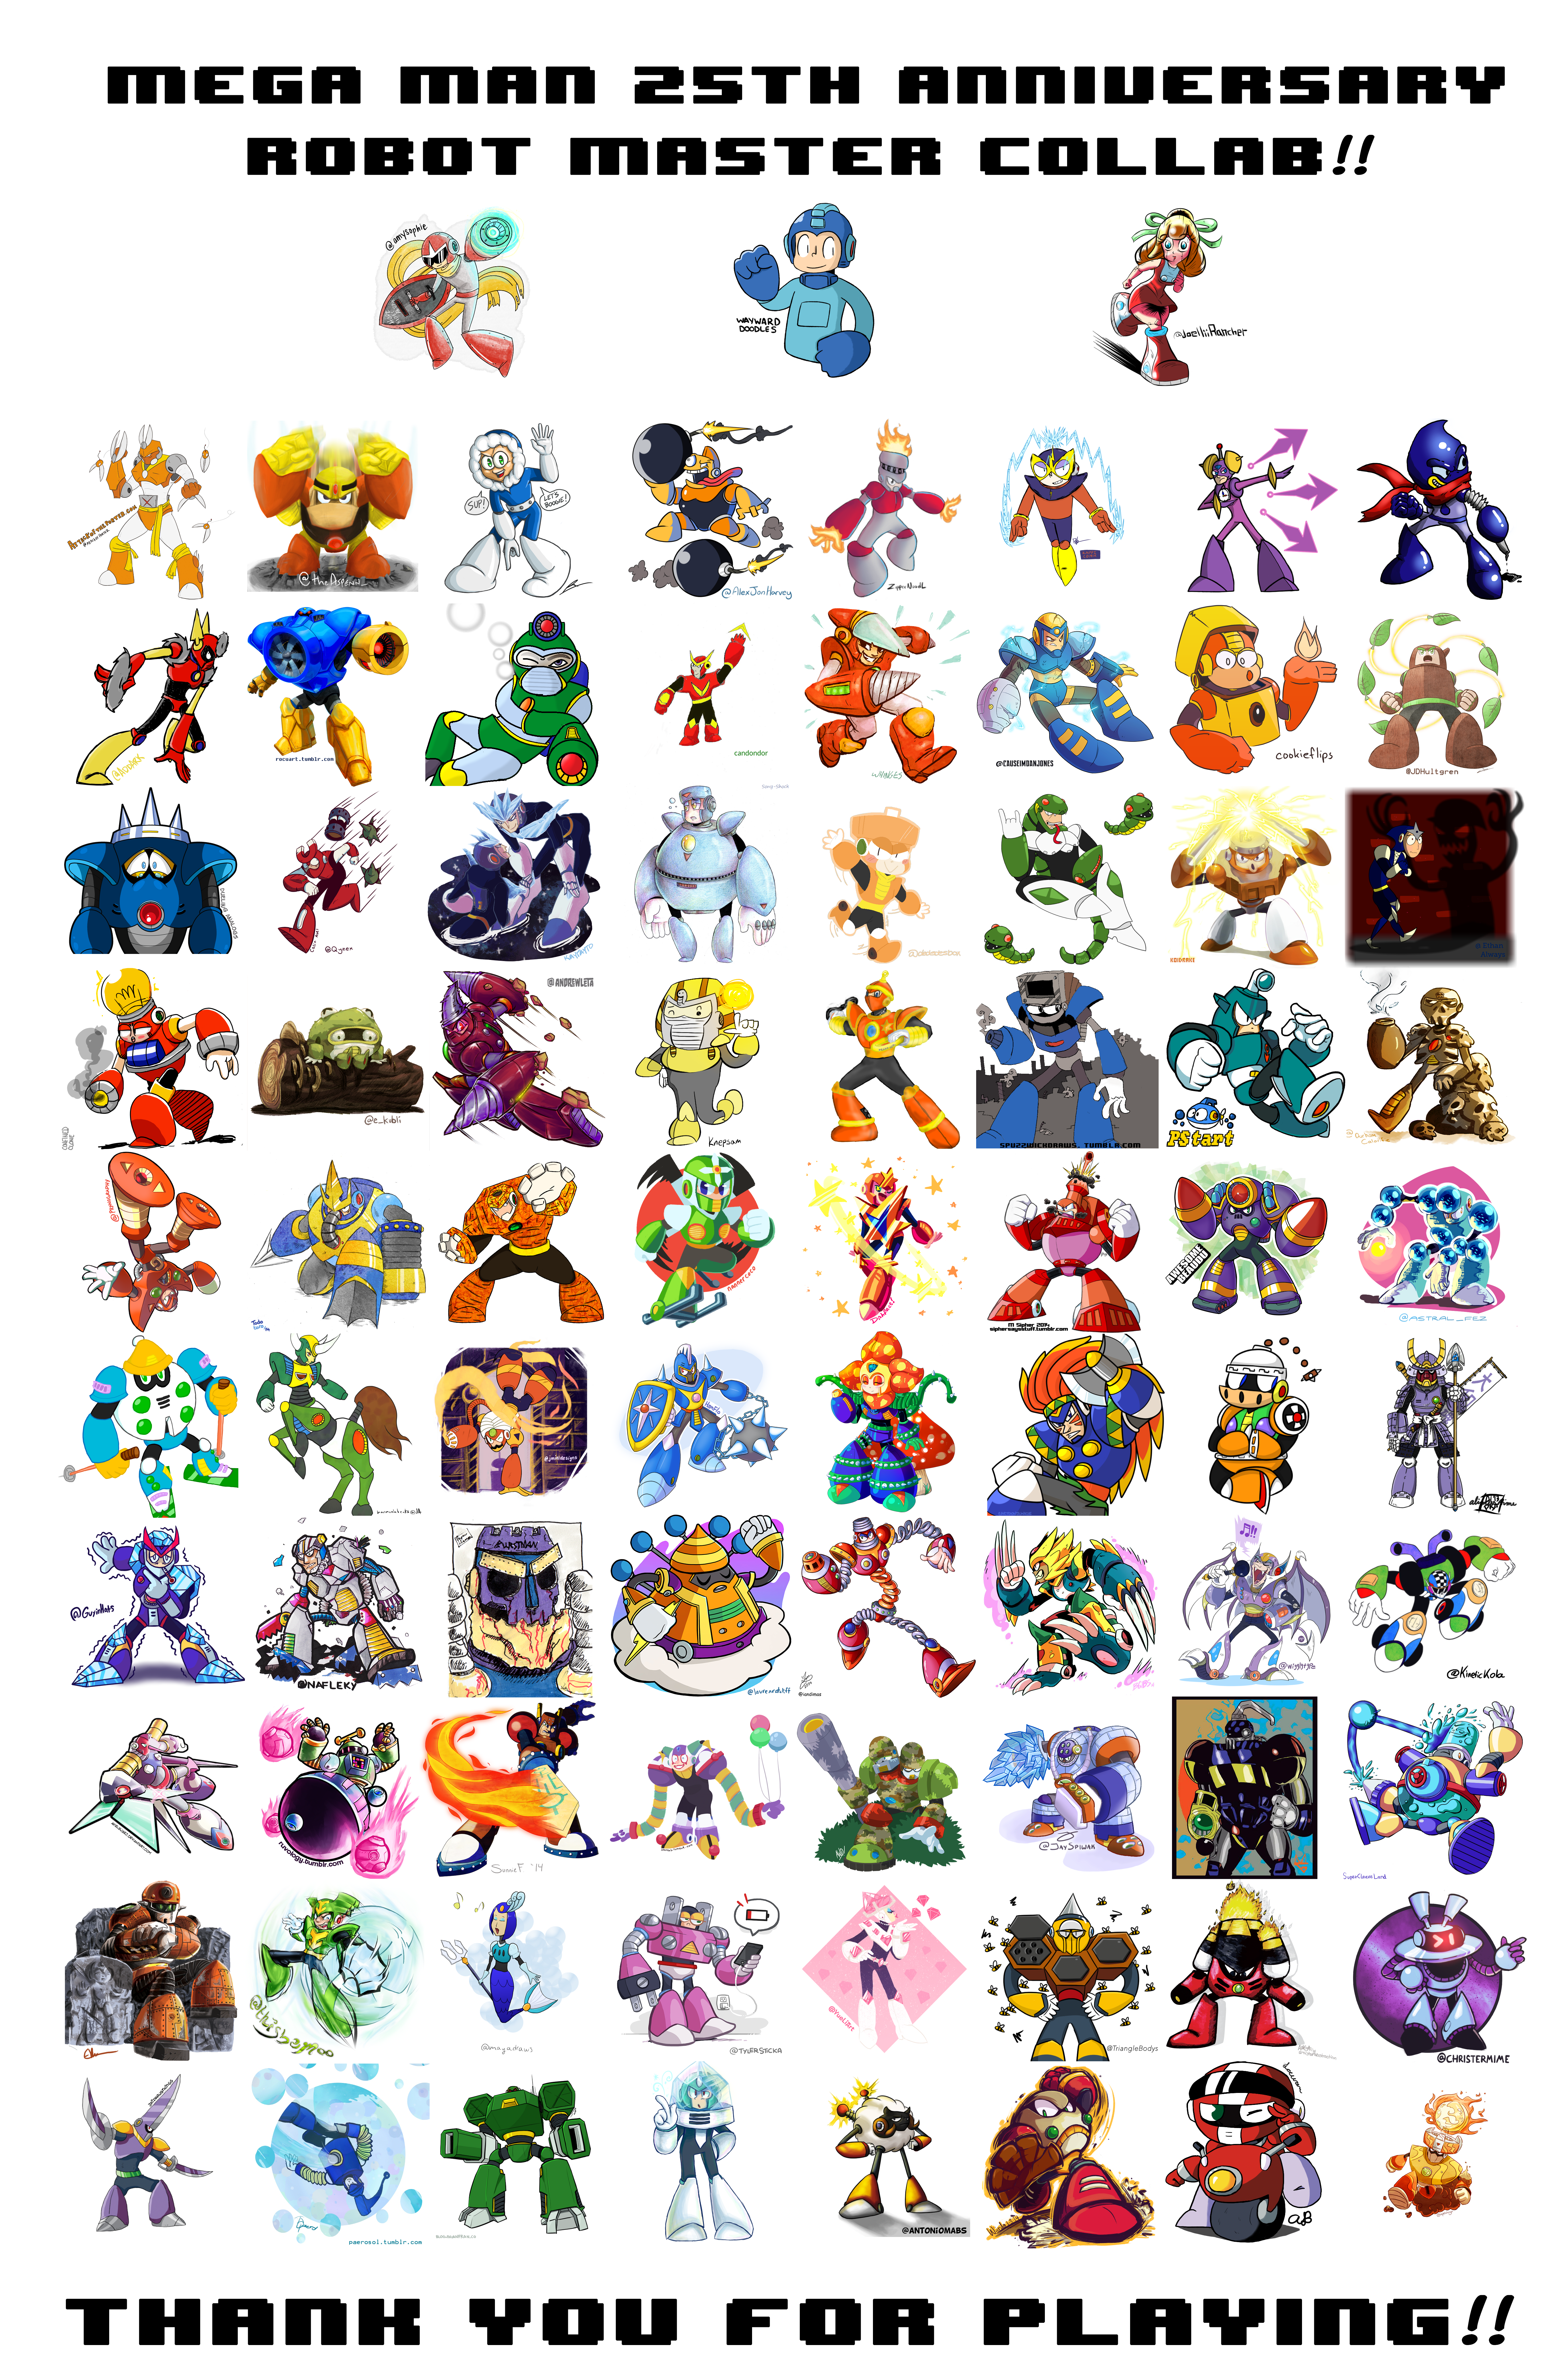 Mega Man 25th Anniversary Robot Master Collab by WaywardDoodles